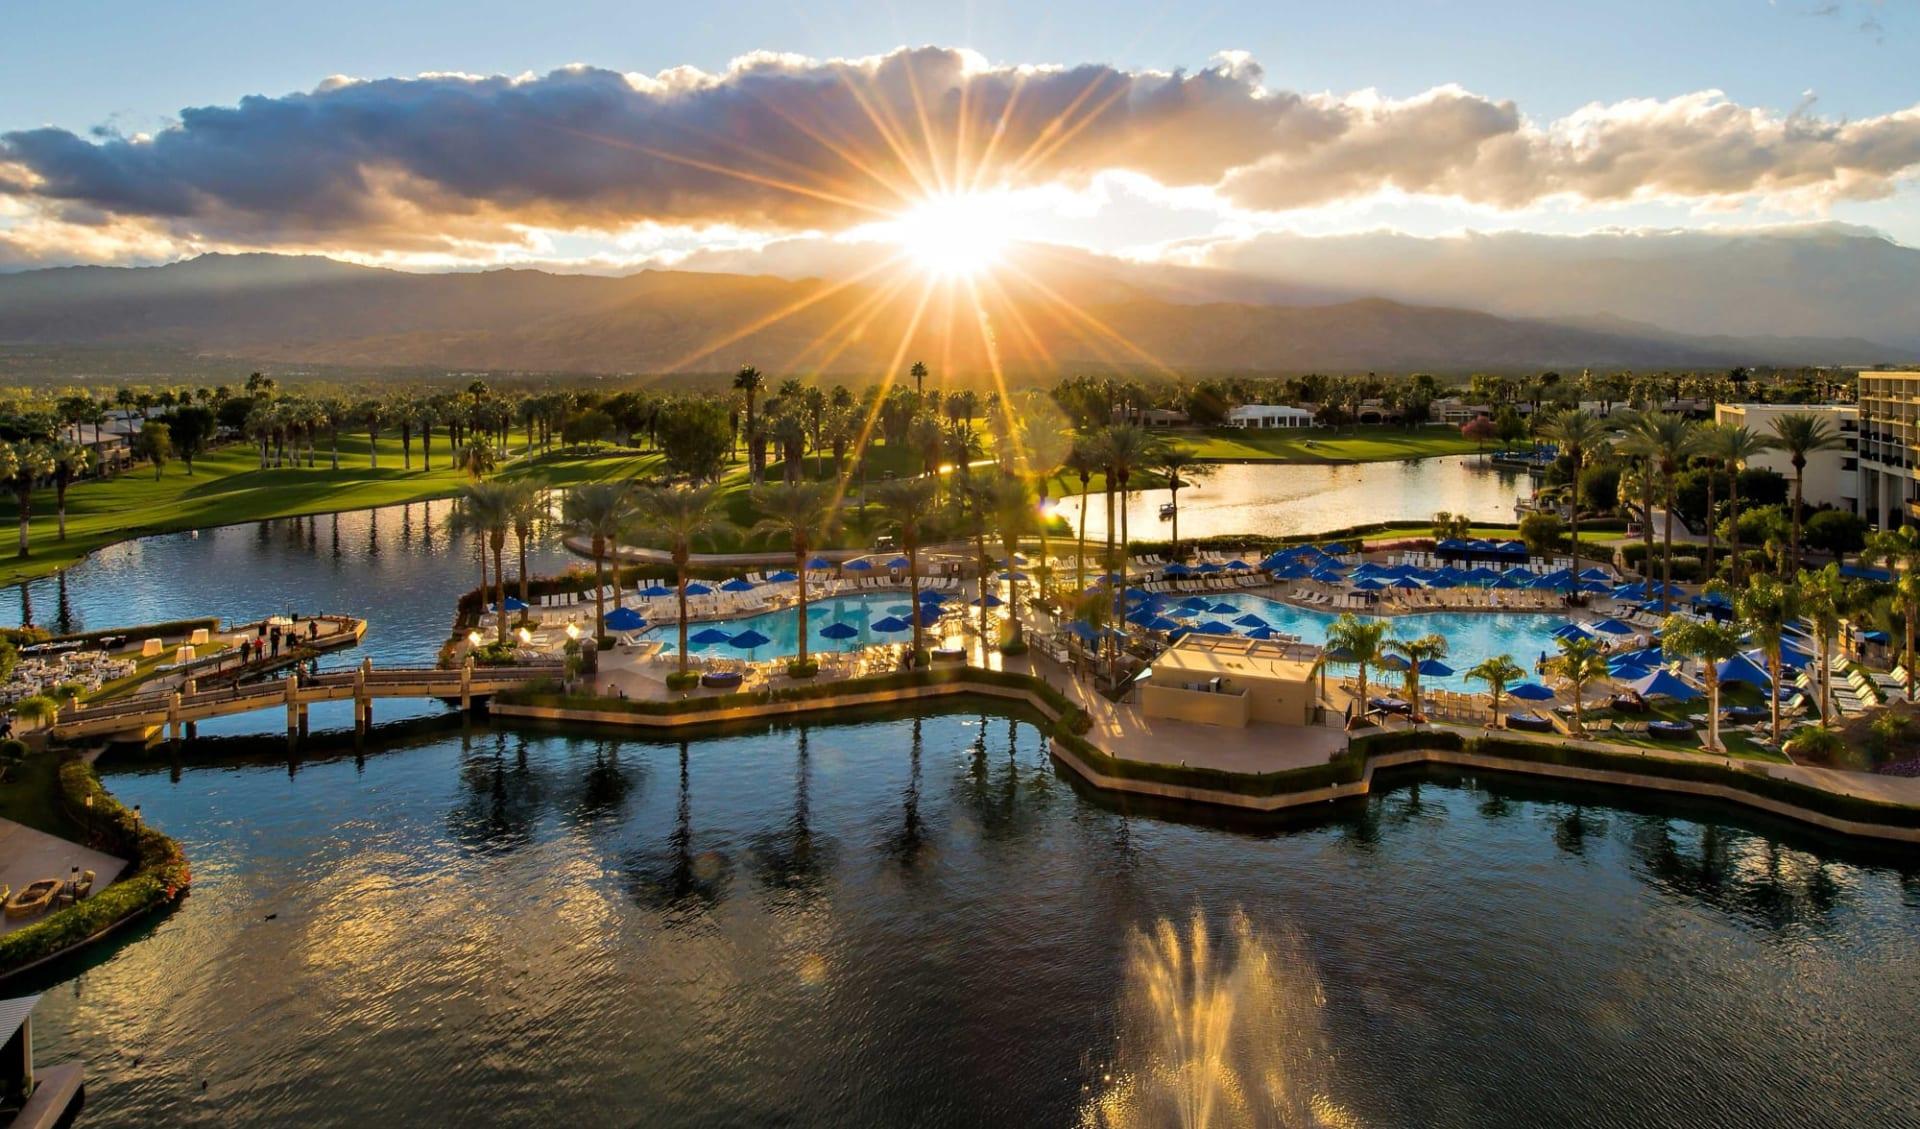 JW Marriott Desert Springs Resort & Spa in Palm Desert: Exterior_JW Marriott Desert Spring_Aussenansicht